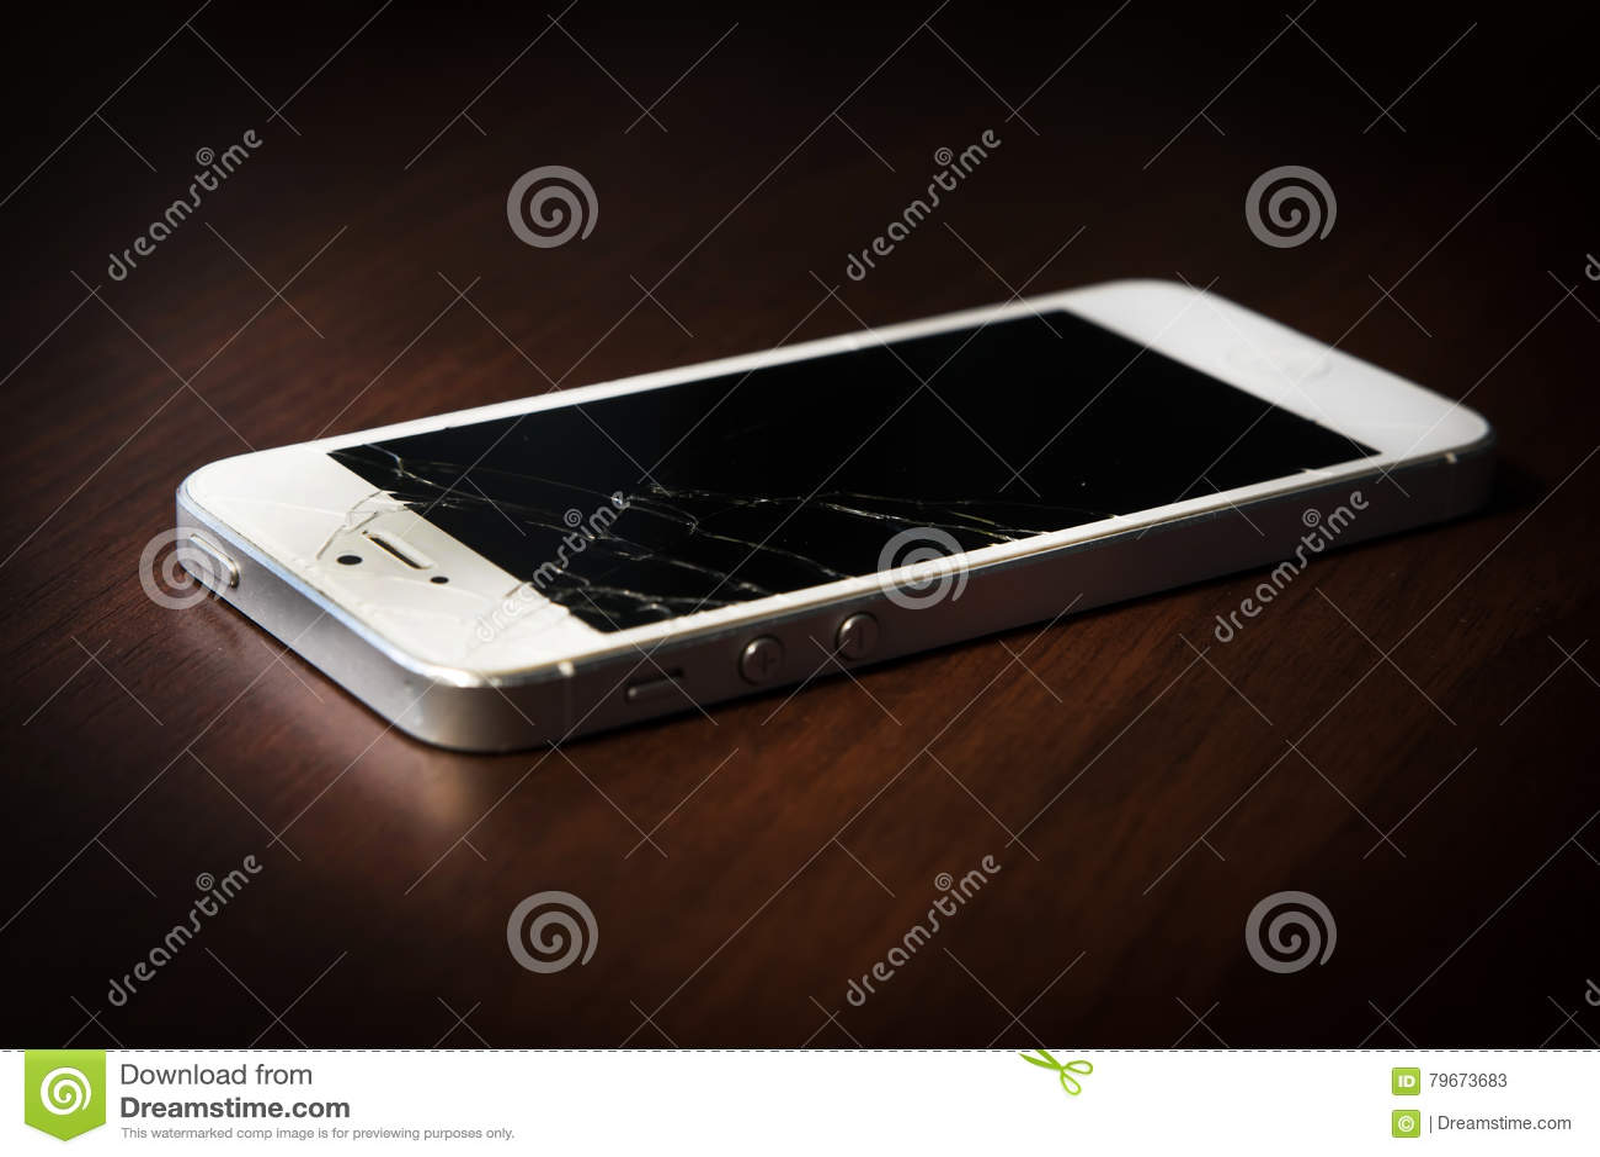 Łamany telefon na stole, czerń ekran